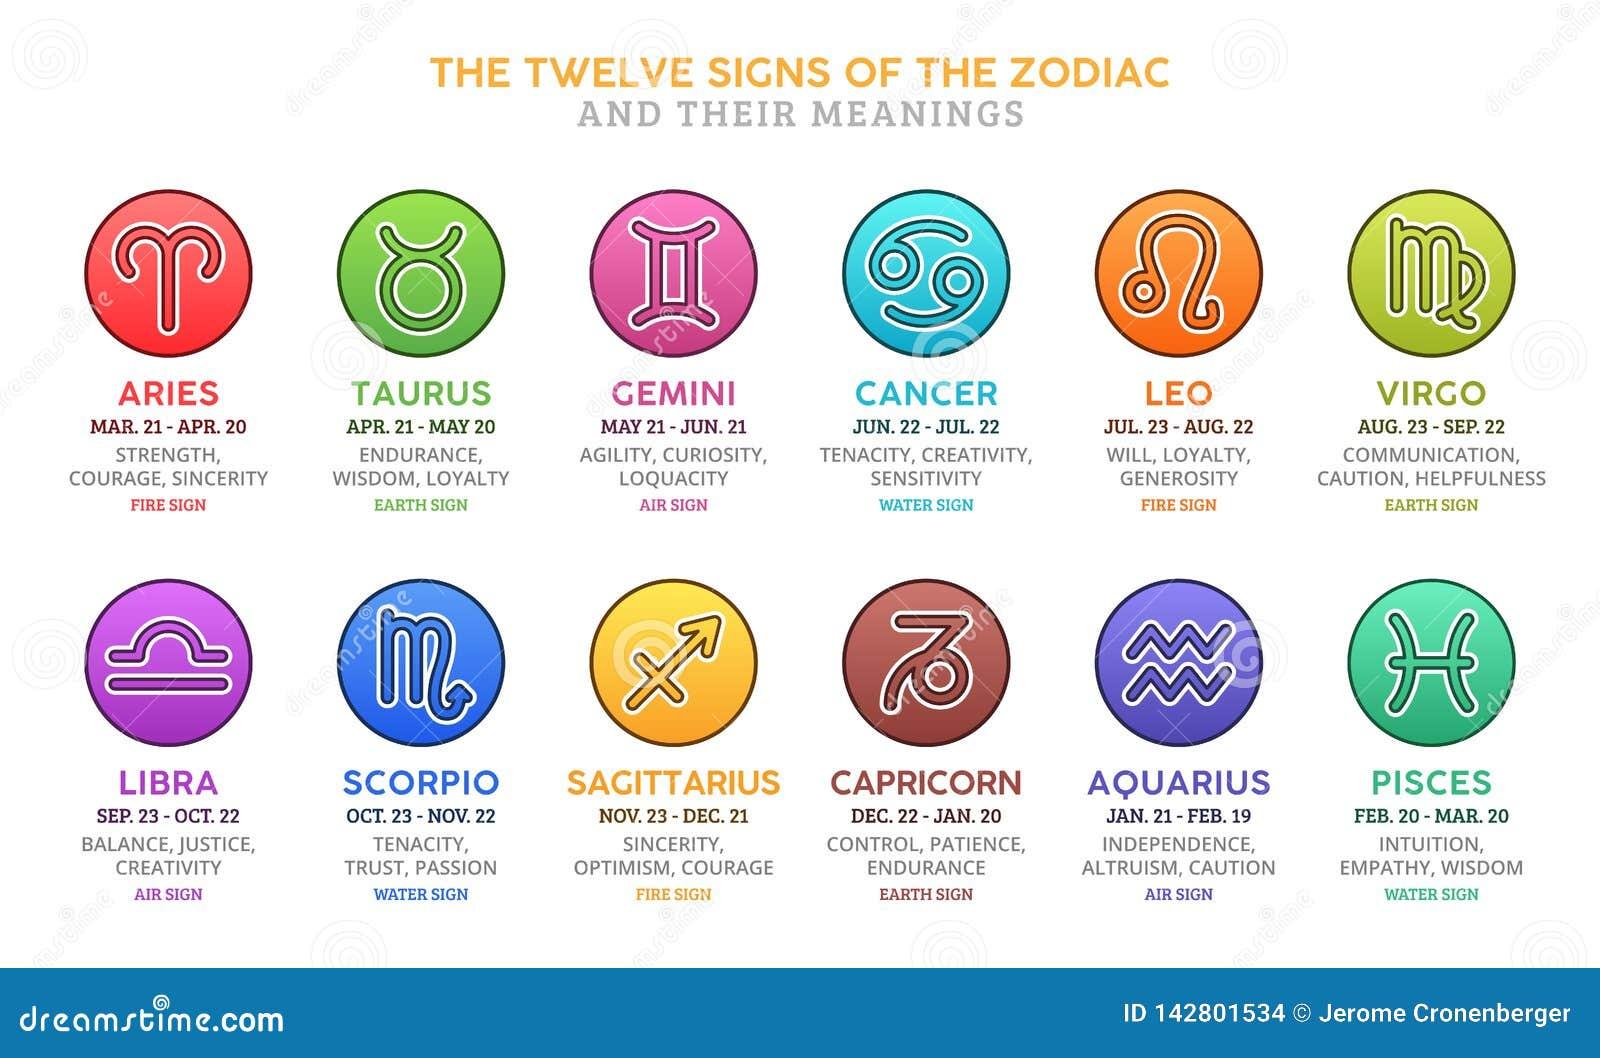 Gemini's Father in the Horoscope